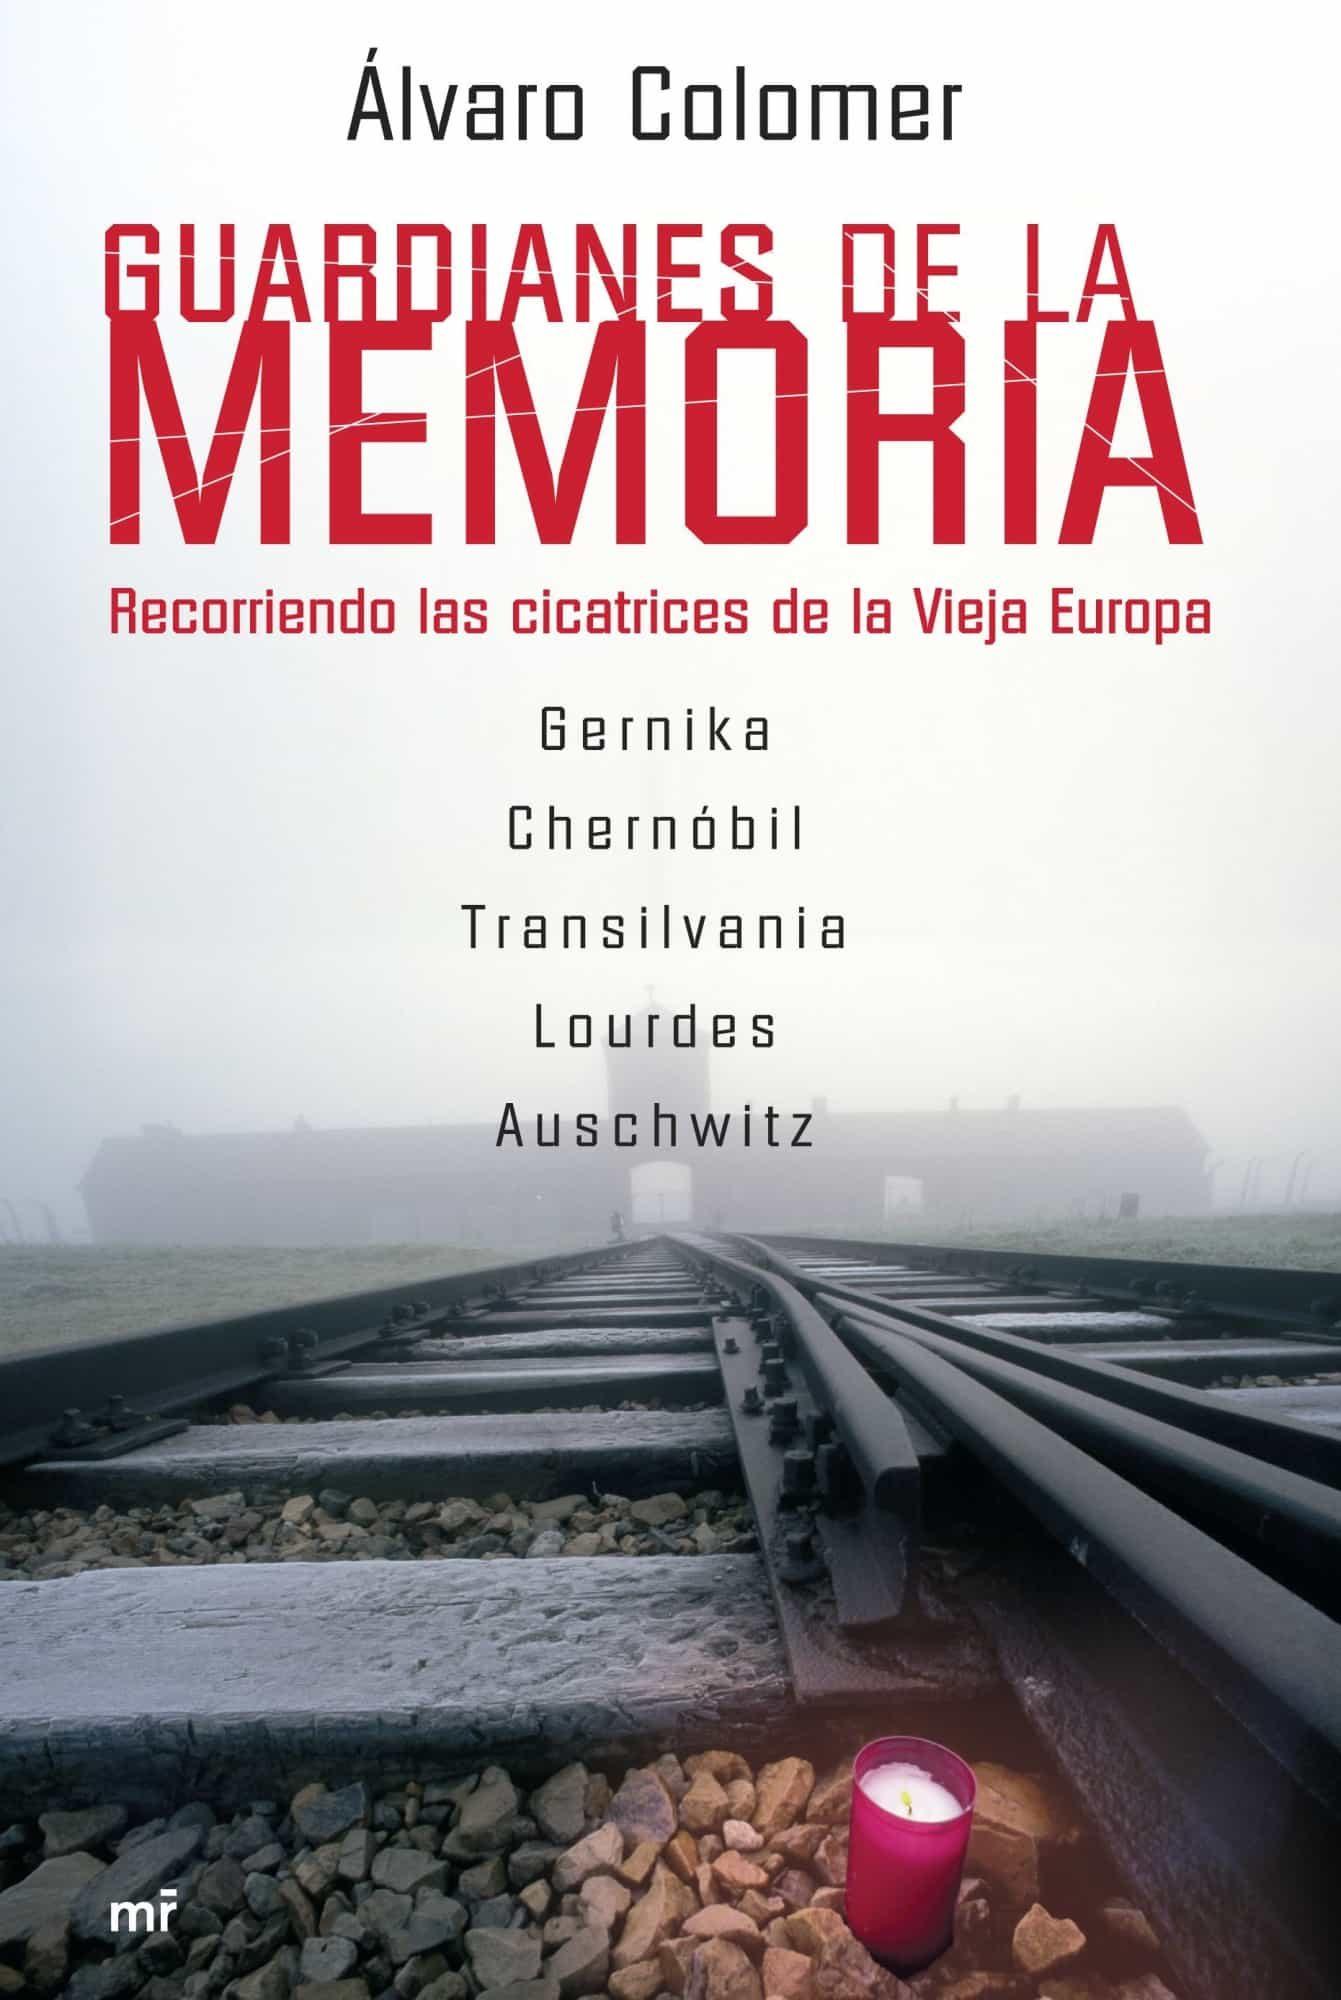 Guardianes De La Memoria: Recorriendo Las Cicatrices De La Vieja Europa por Alvaro Colomer epub